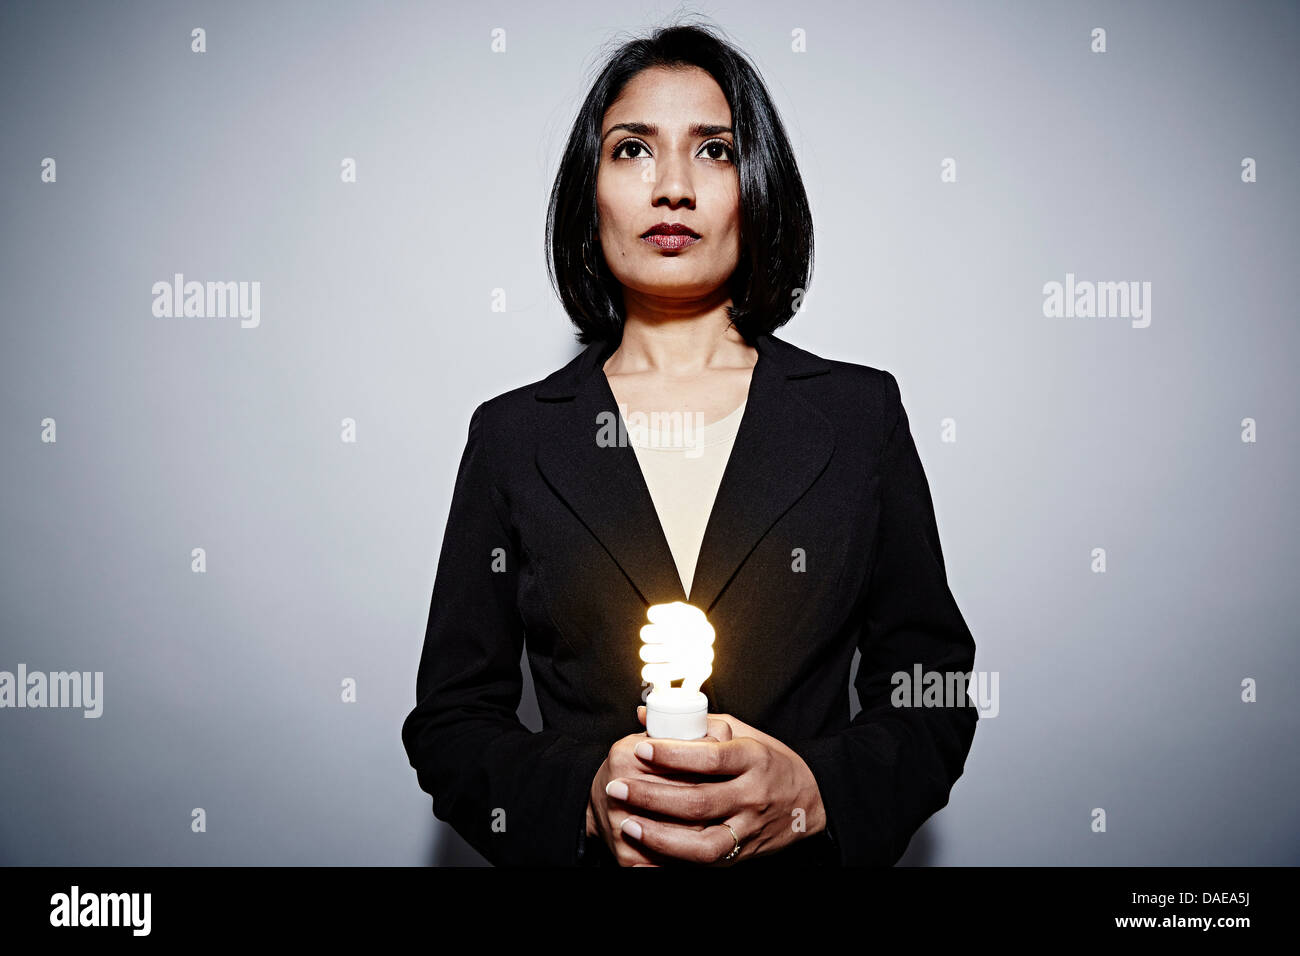 Studio portrait of businesswoman holding energy saving lightbulb Photo Stock